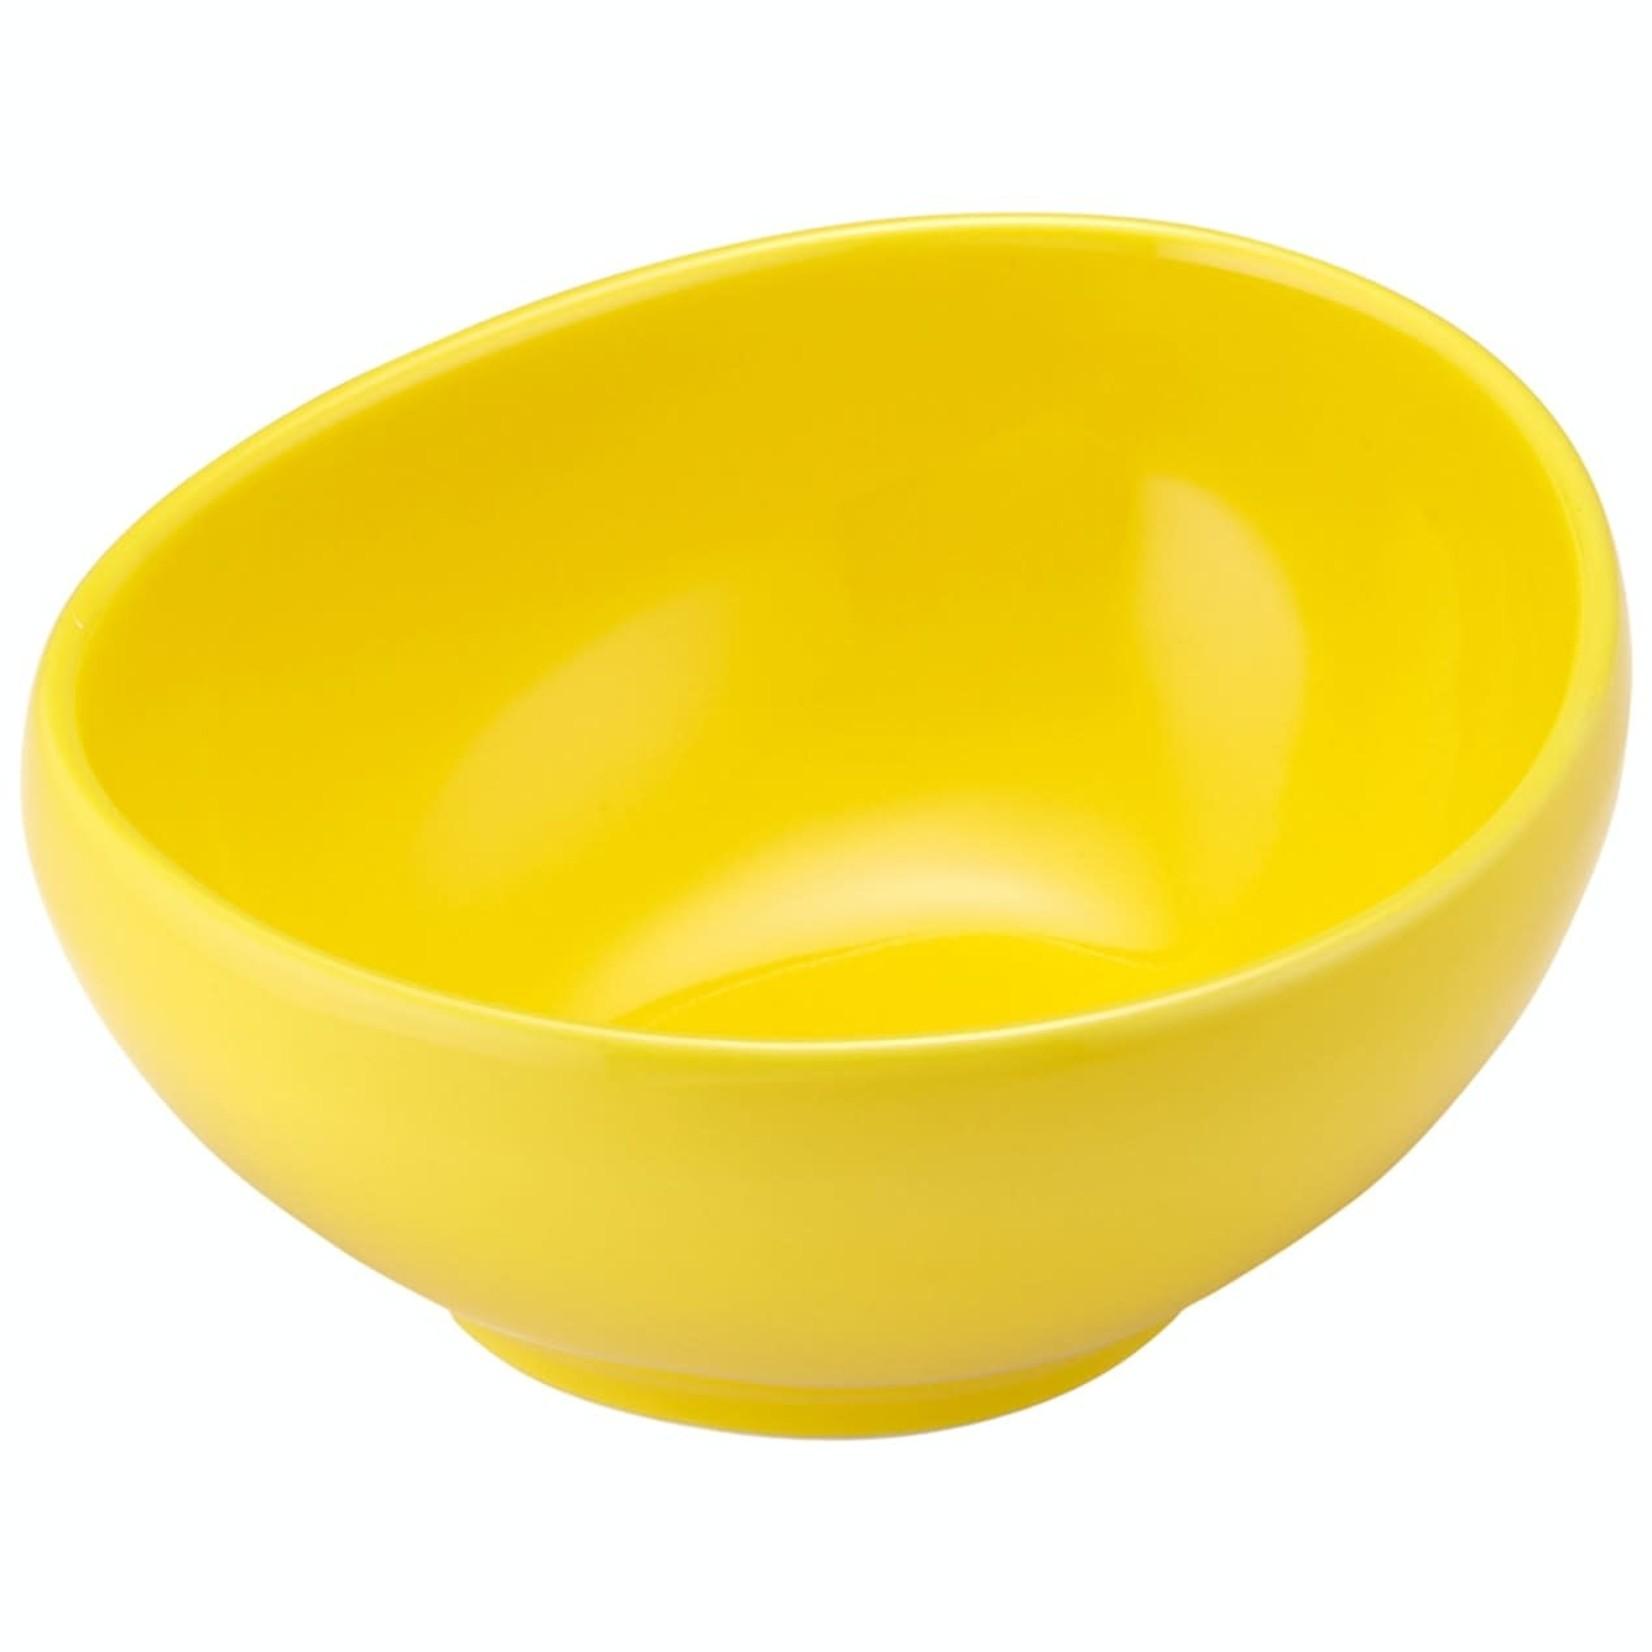 Ladelle Mi Casa White Lemon Bowl